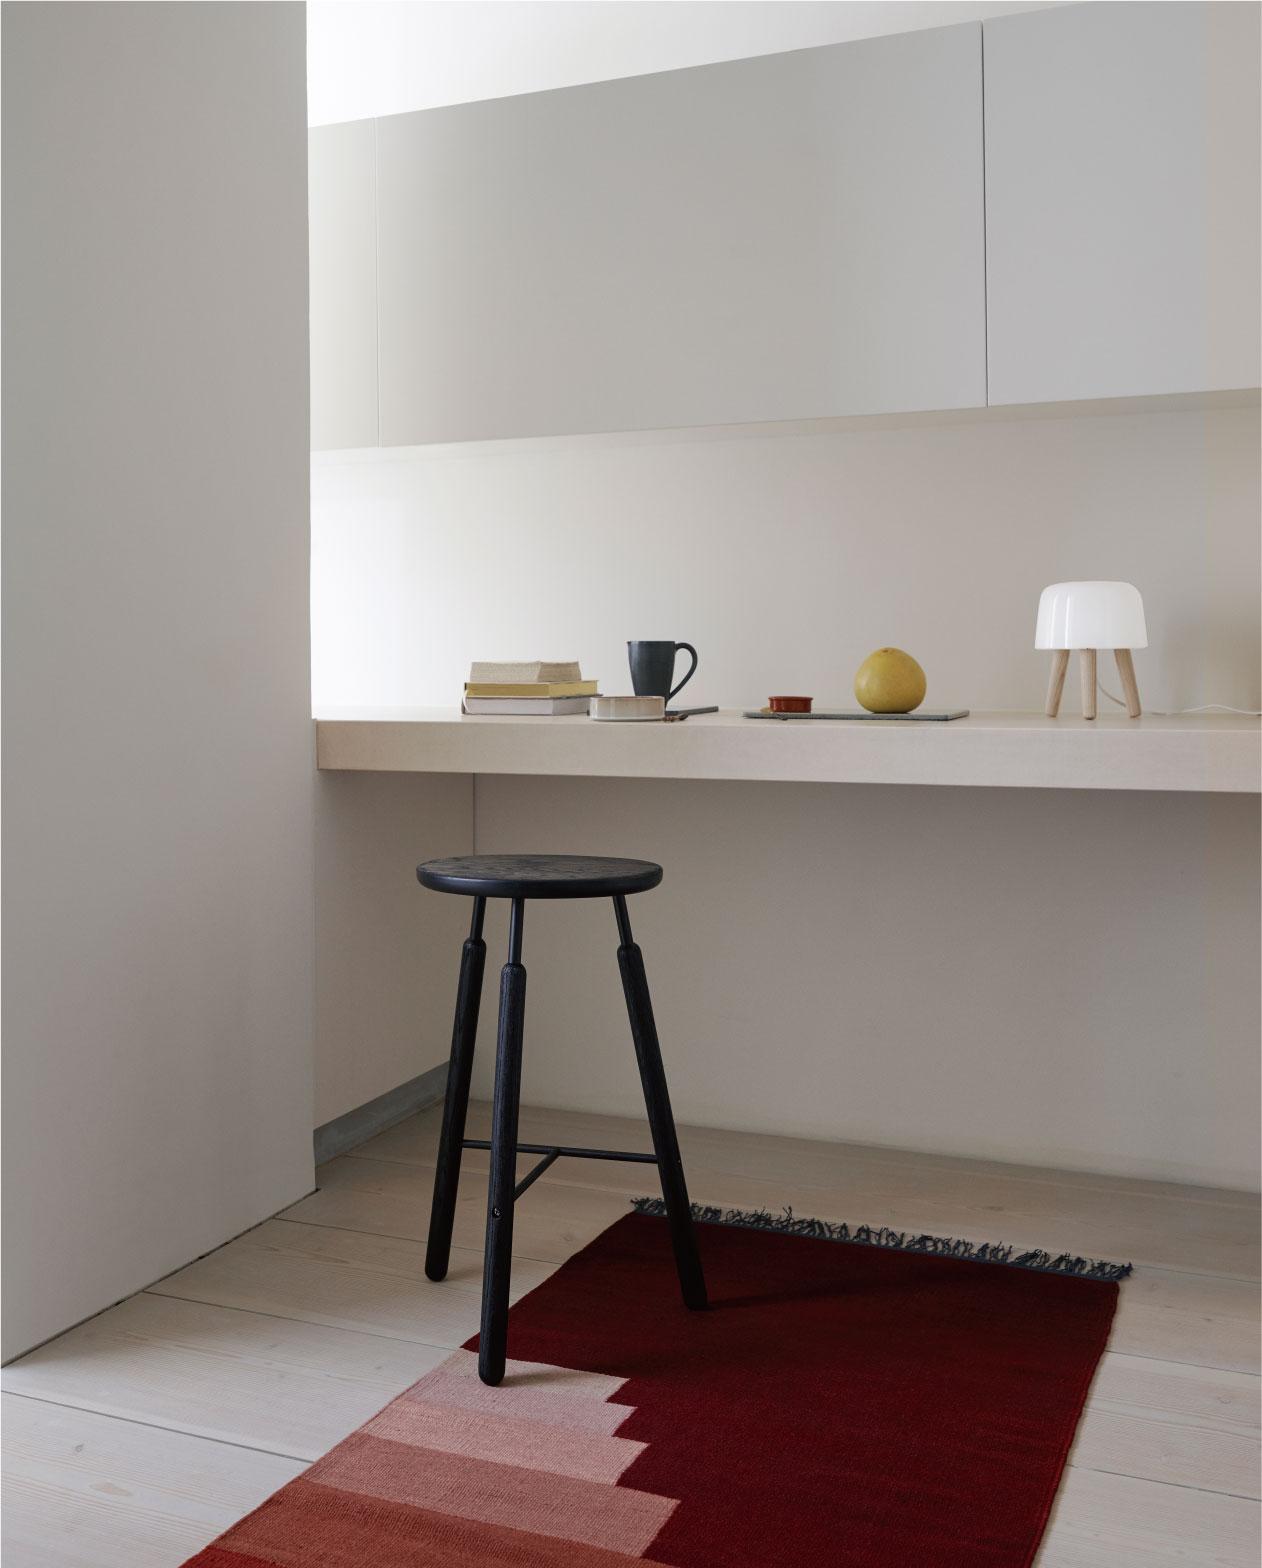 MILK TABLE LAMP イメージ画像